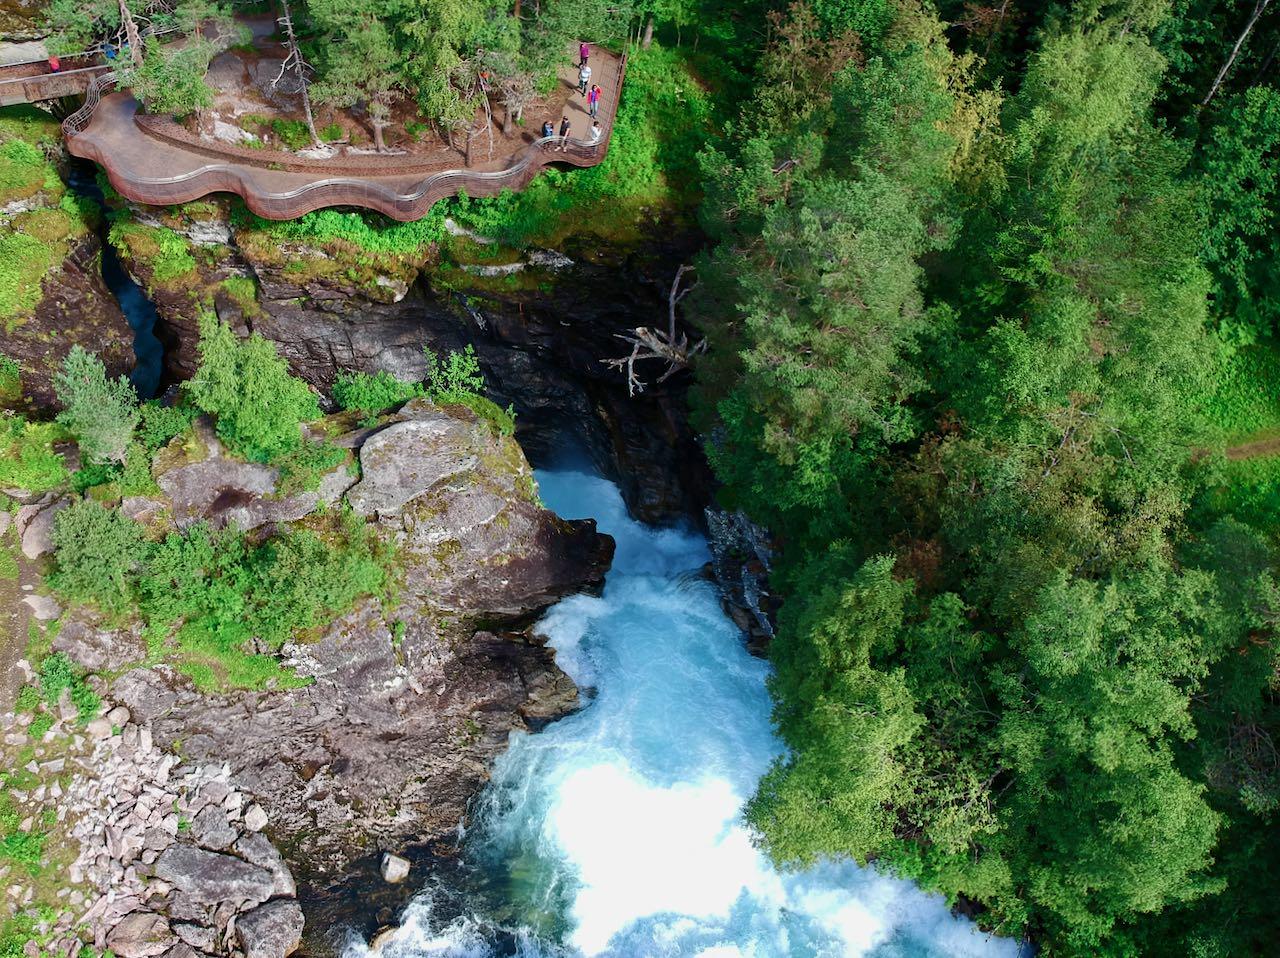 Gudbrandsjuvet 33 travel tips Norway